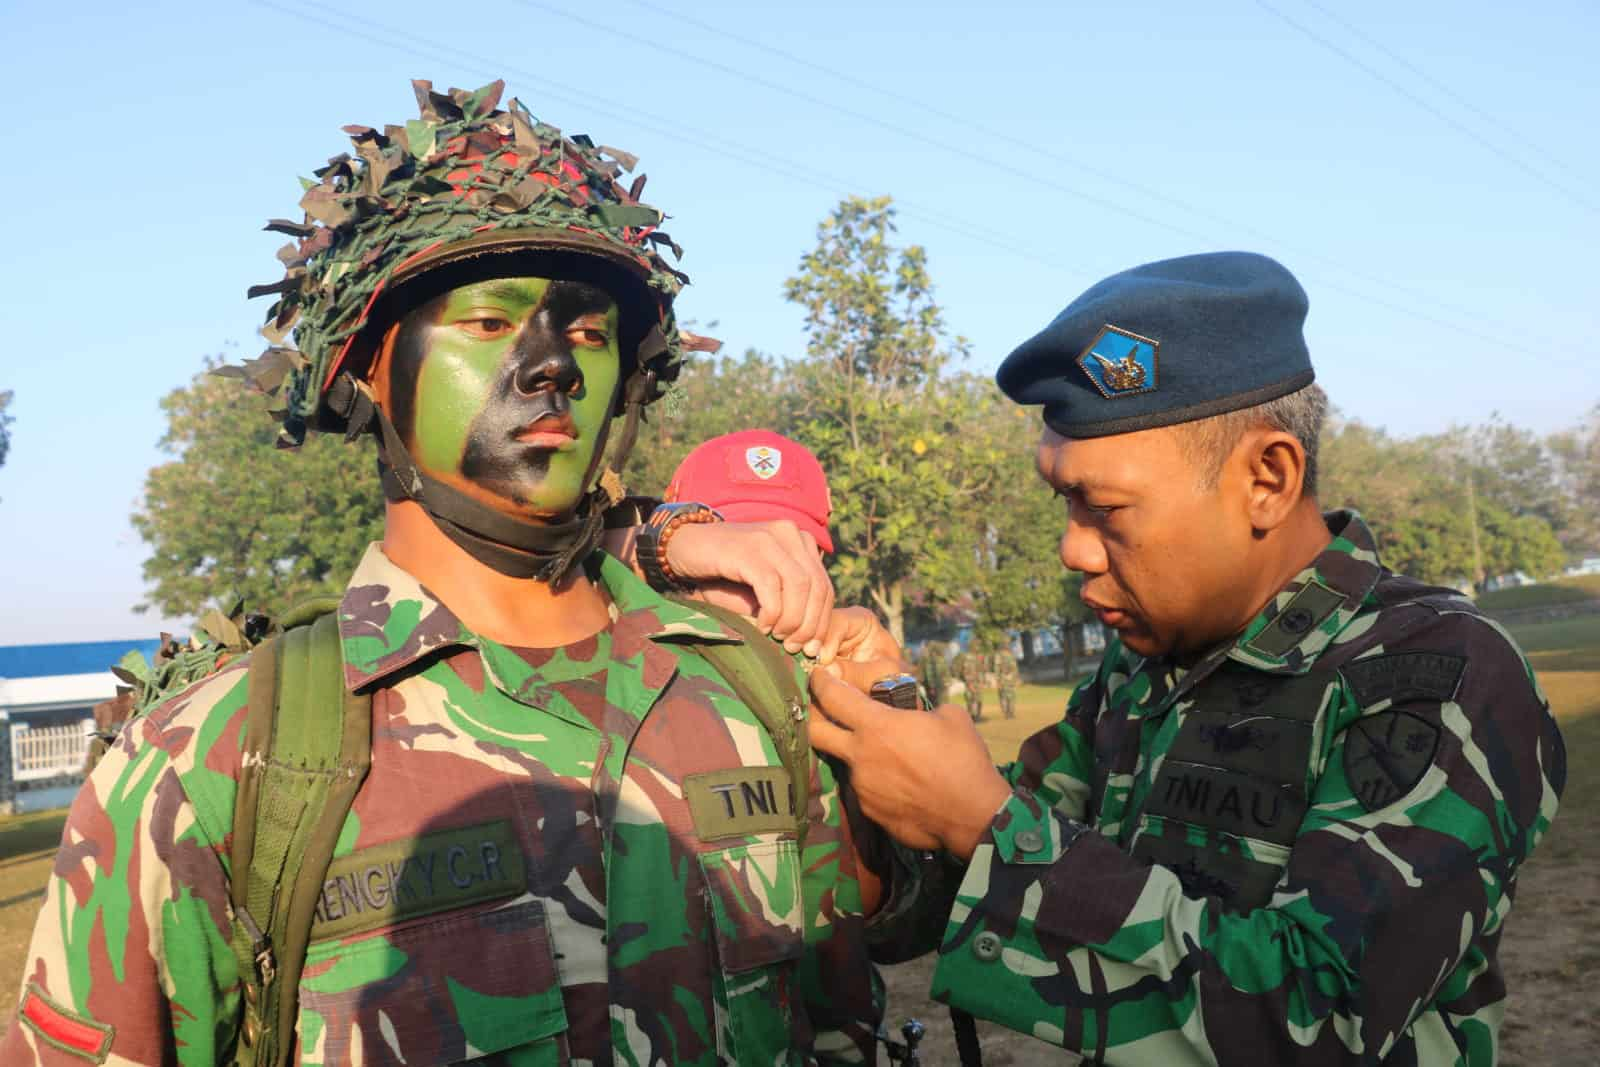 Komandan Lanud Sulaiman Buka Lattis Siswa Paskhas Skadik 204 Lanud Sulaiman